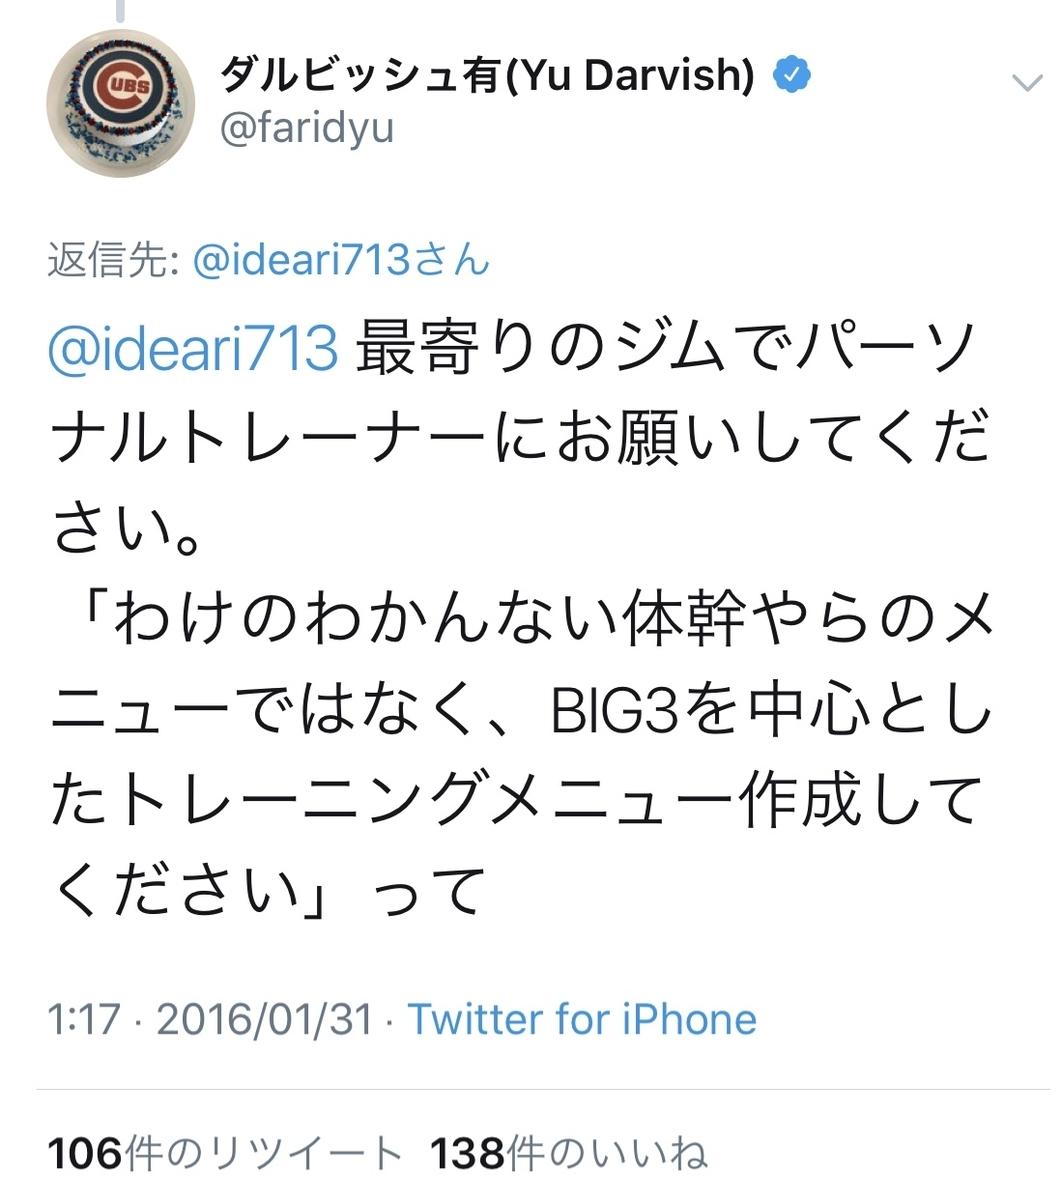 f:id:baseballtraining:20190503164747j:plain